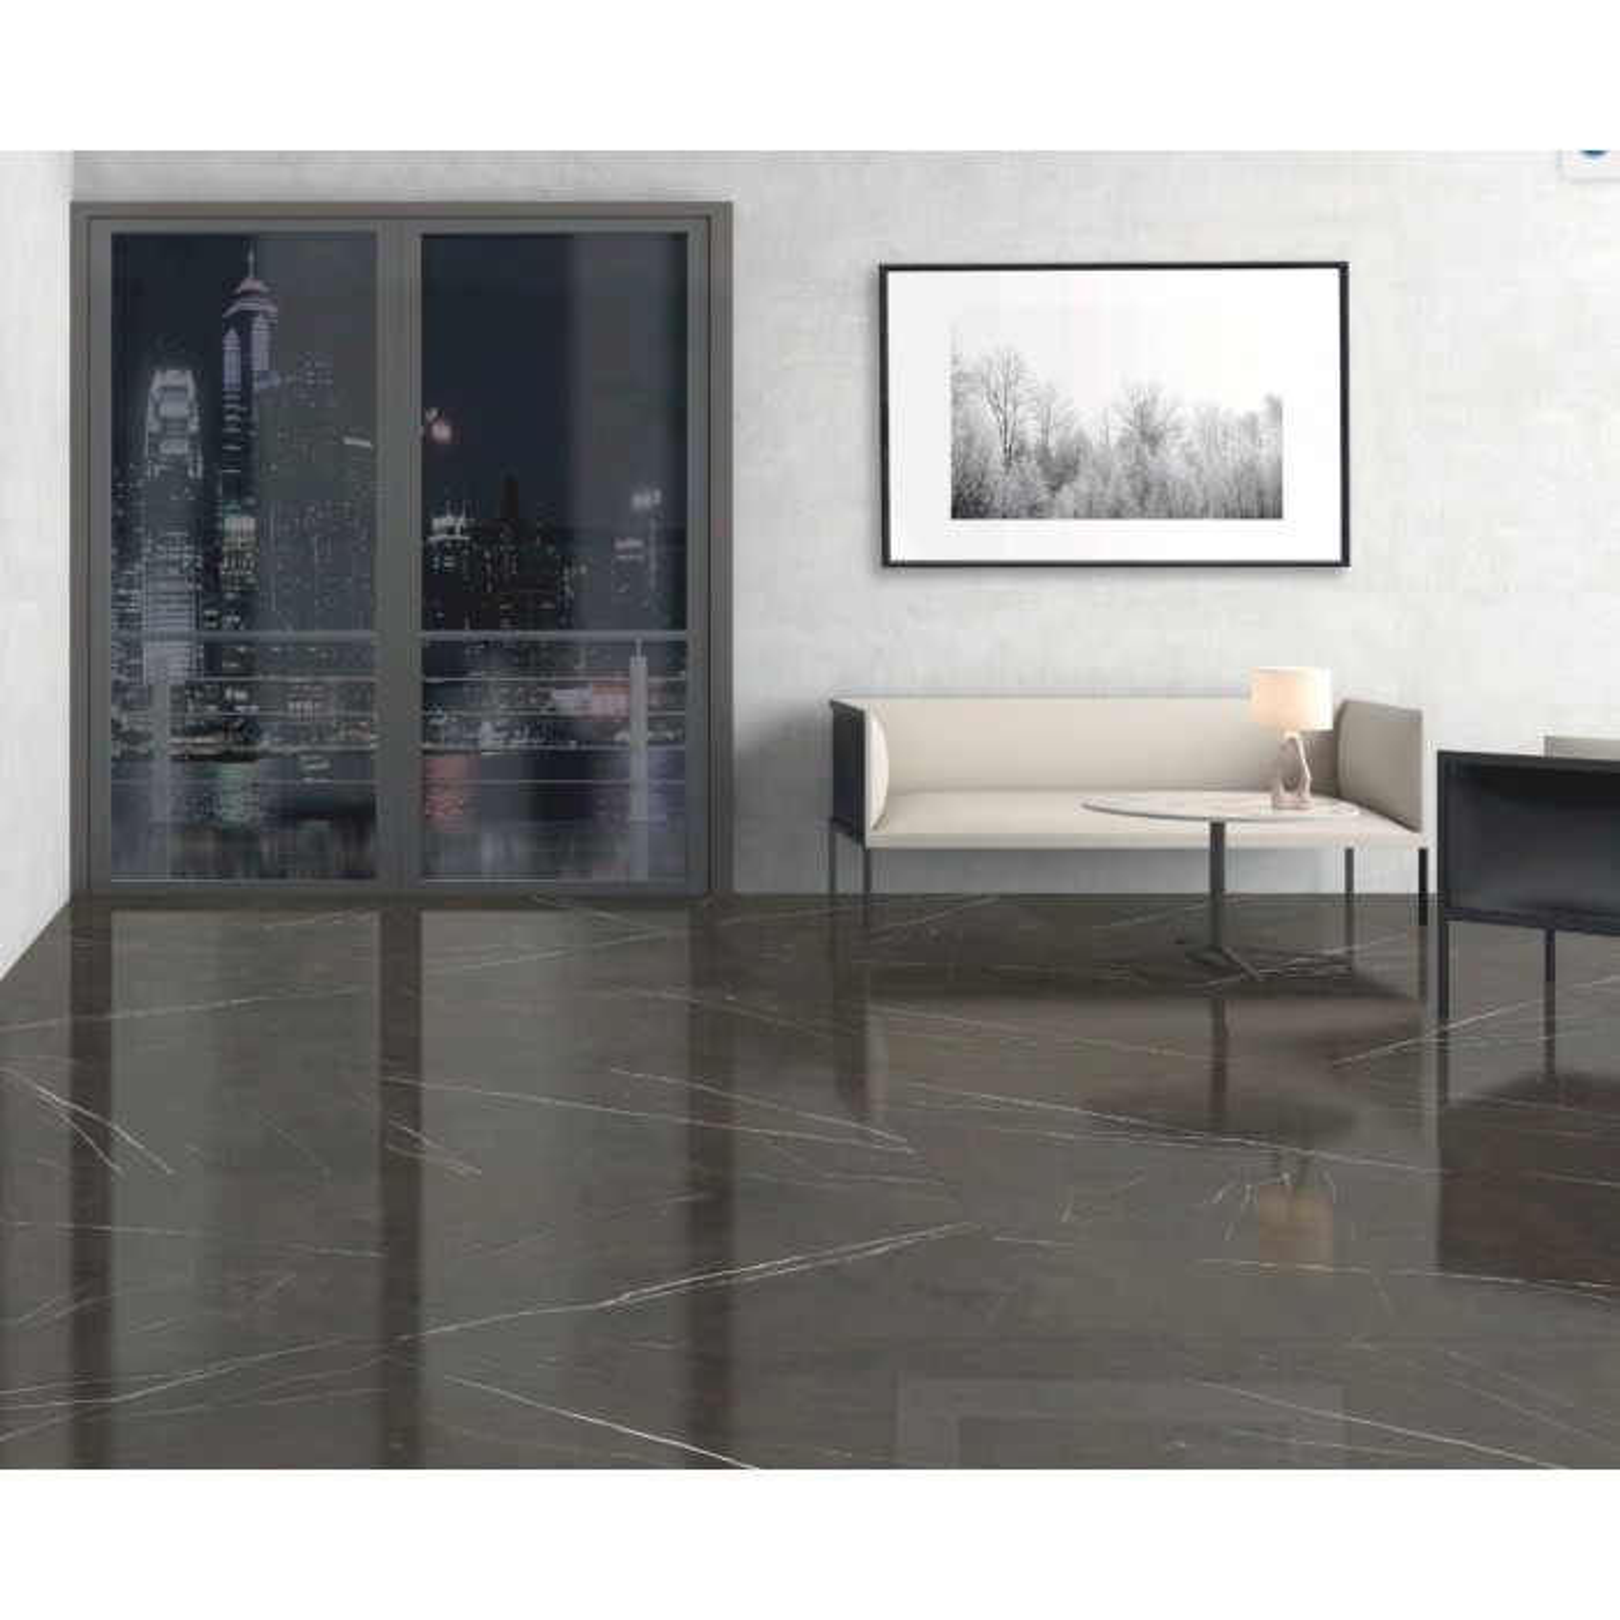 Carrelage gr s c rame effet marbre pietra grey gris chaud for Carrelage gres cerame gris